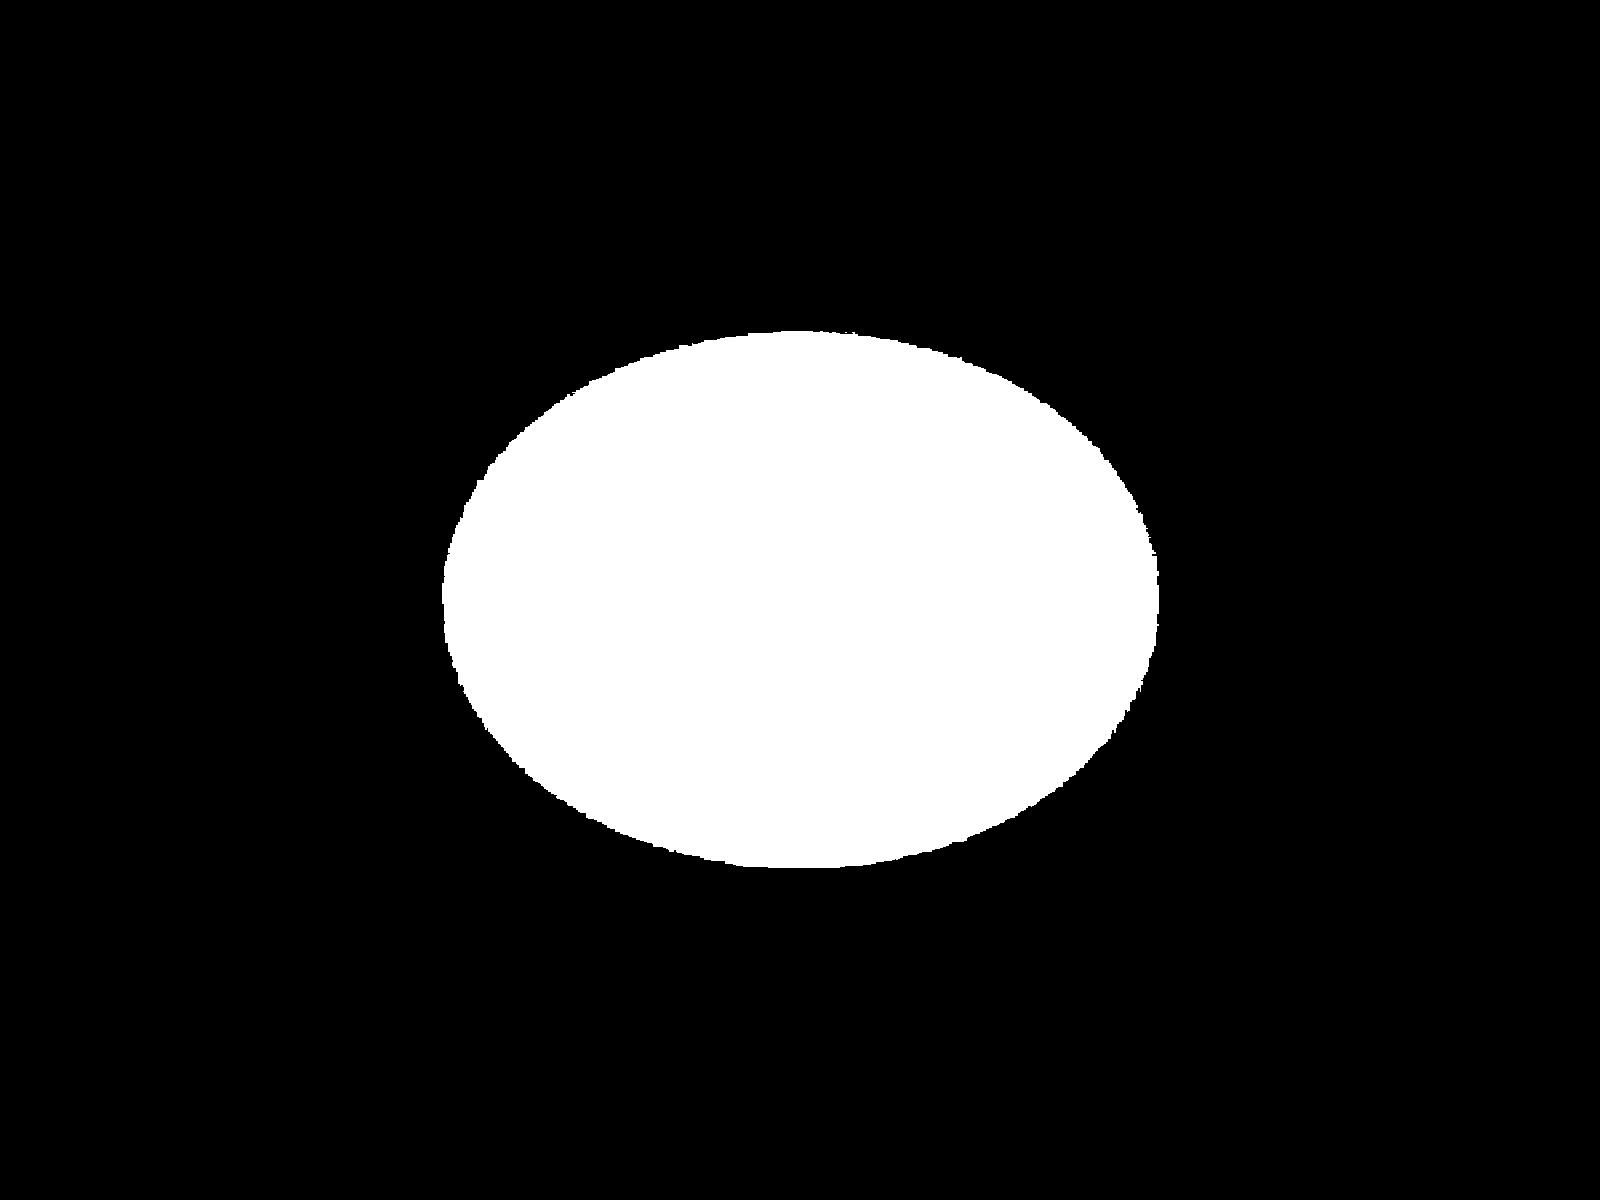 Click image for larger version.  Name:13 black oval vignette.png Views:34190 Size:179.1 KB ID:3680